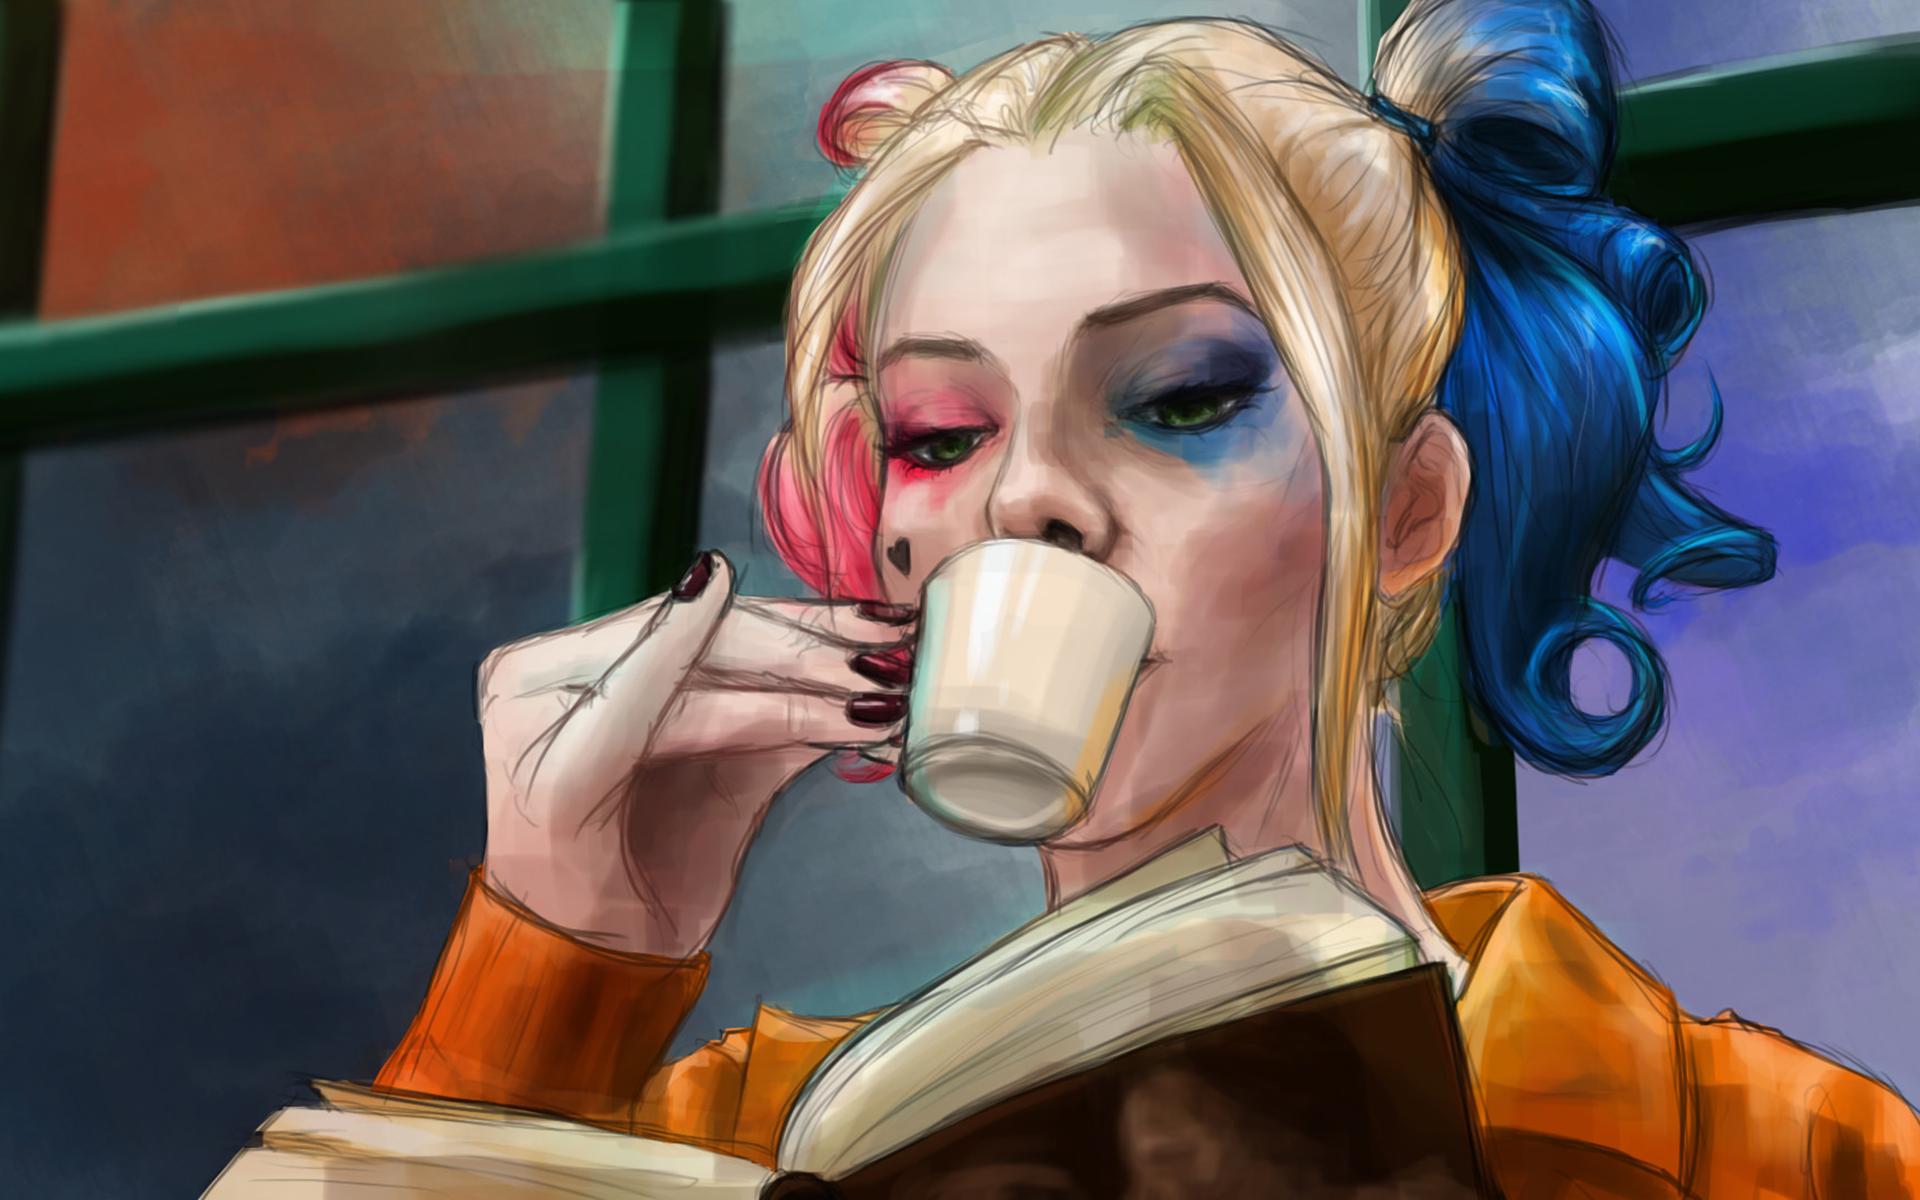 Simple Wallpaper Movie Harley Quinn - harley-quinn-art-image  Collection_419387.jpg